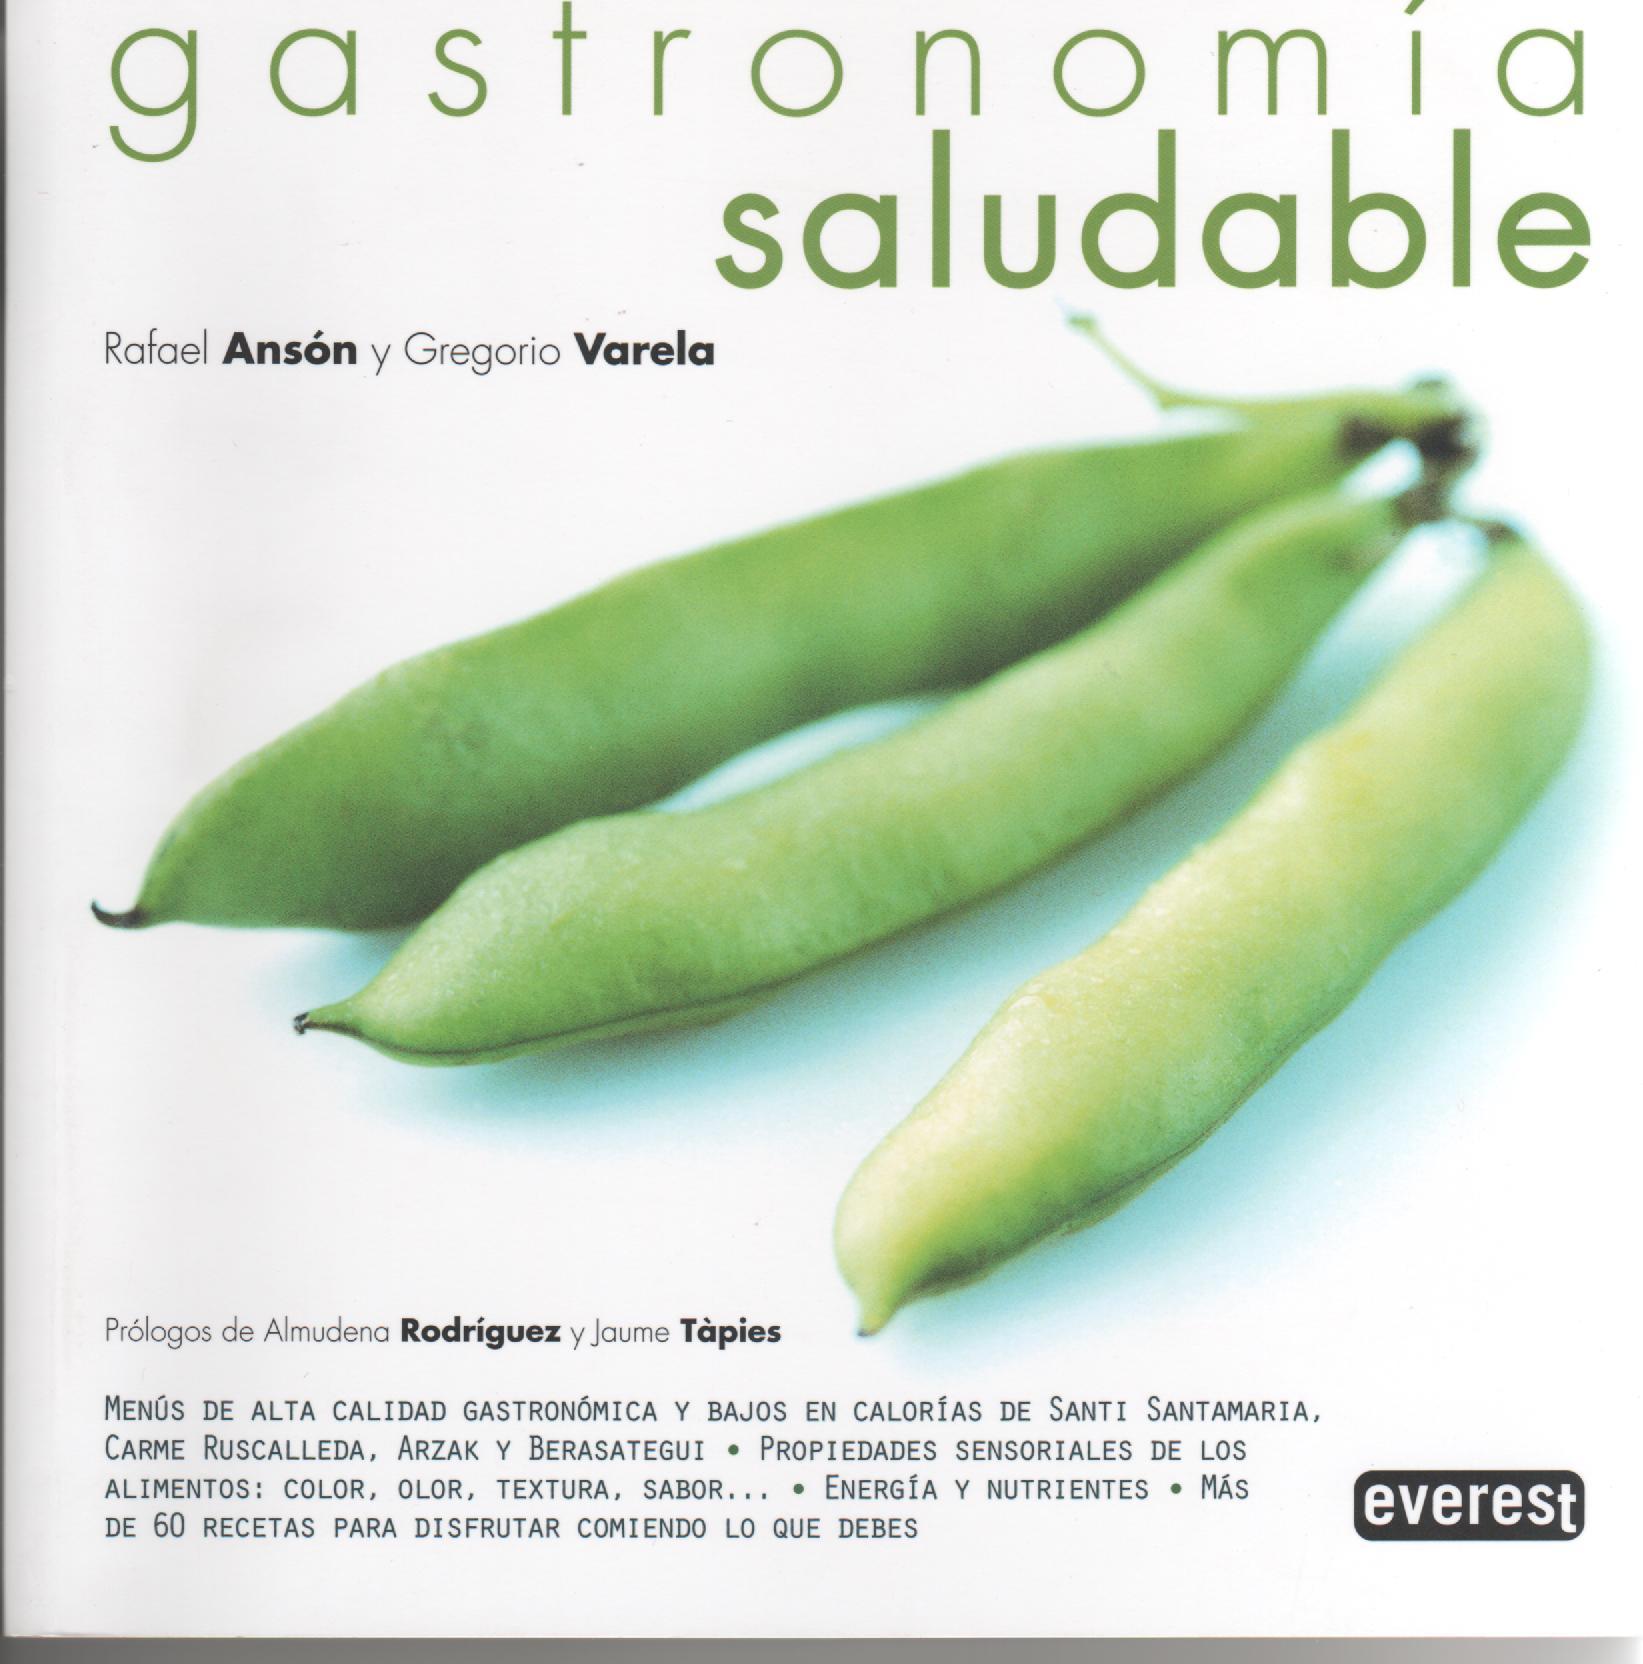 Gastronomica Saludable